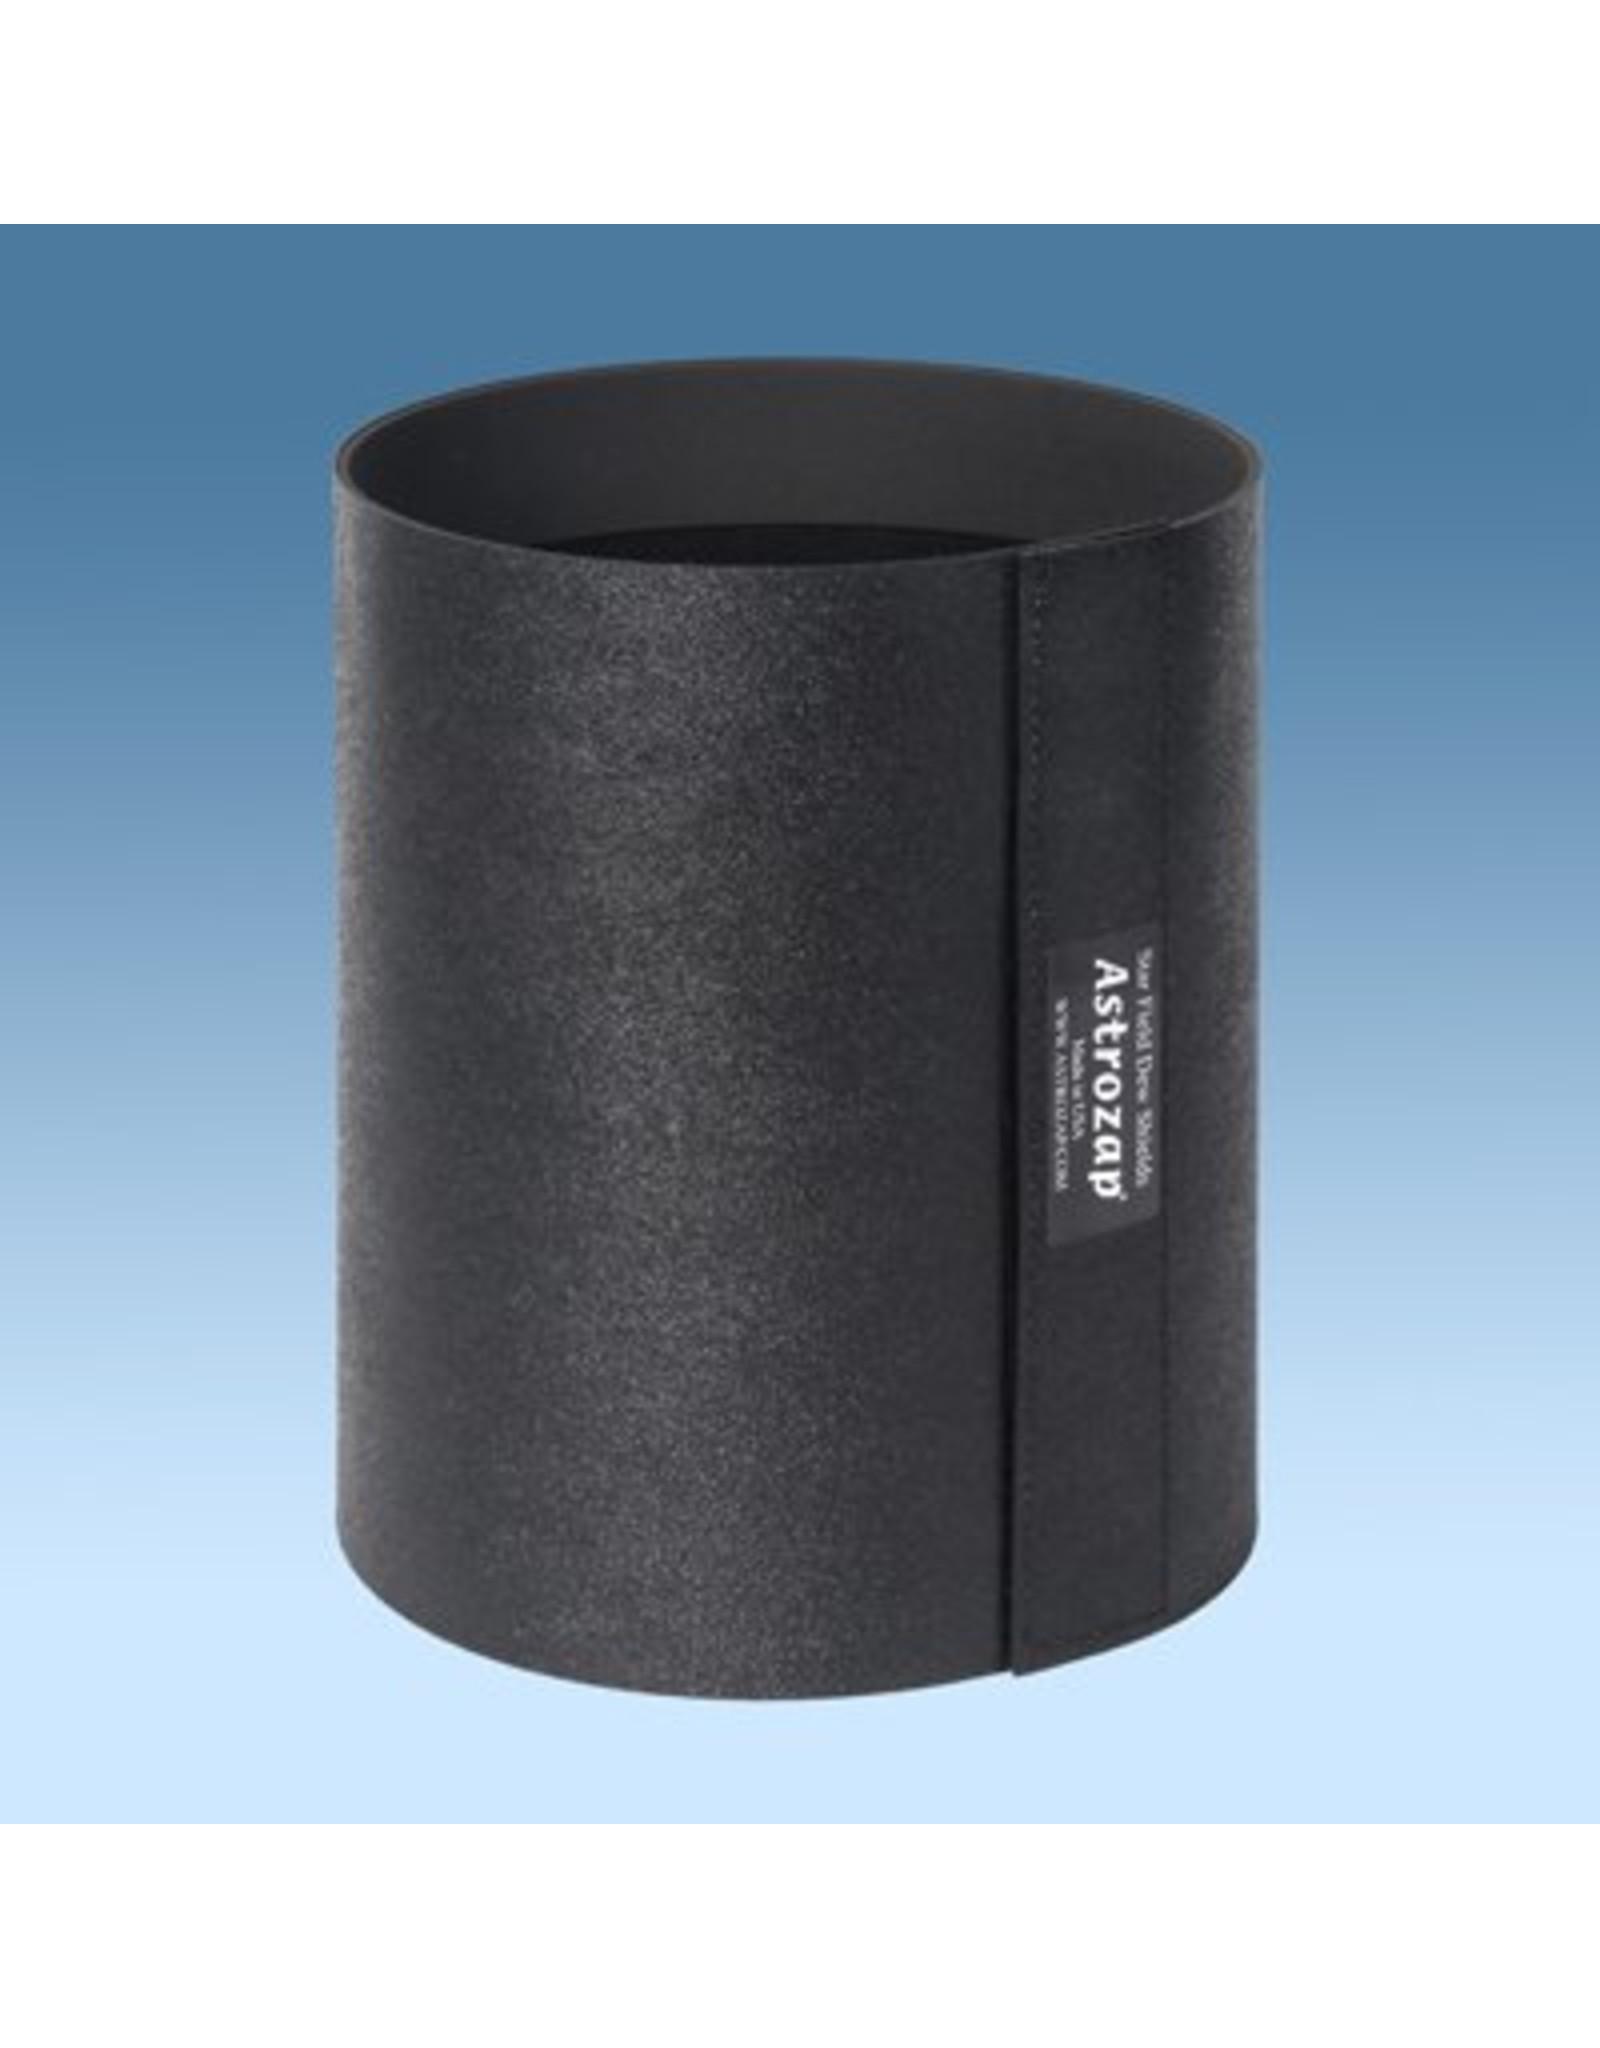 Astrozap Meade 6 ETX LS Flexi-Shield™ Flexible Dew Shield